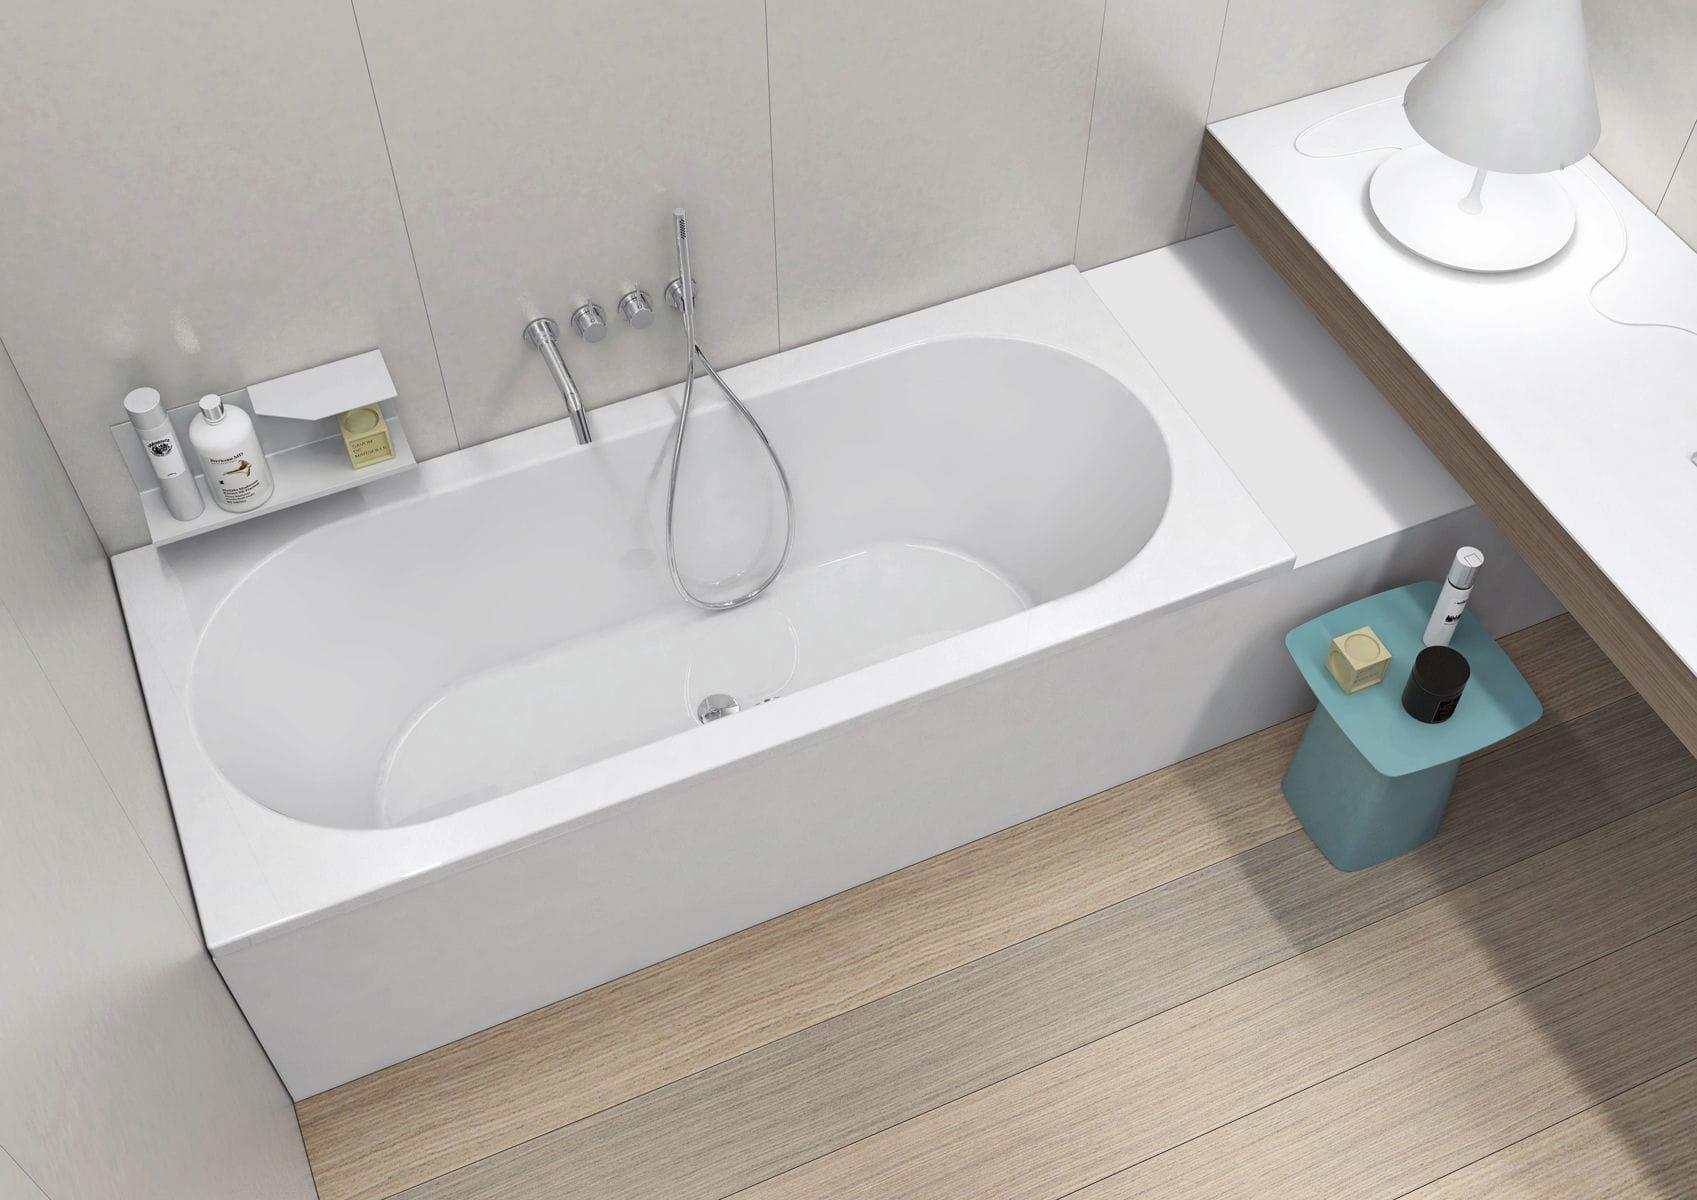 Ricoprire Vasca Da Bagno Prezzi vasca da bagno ovale - eclettico - makro - in corian® / in